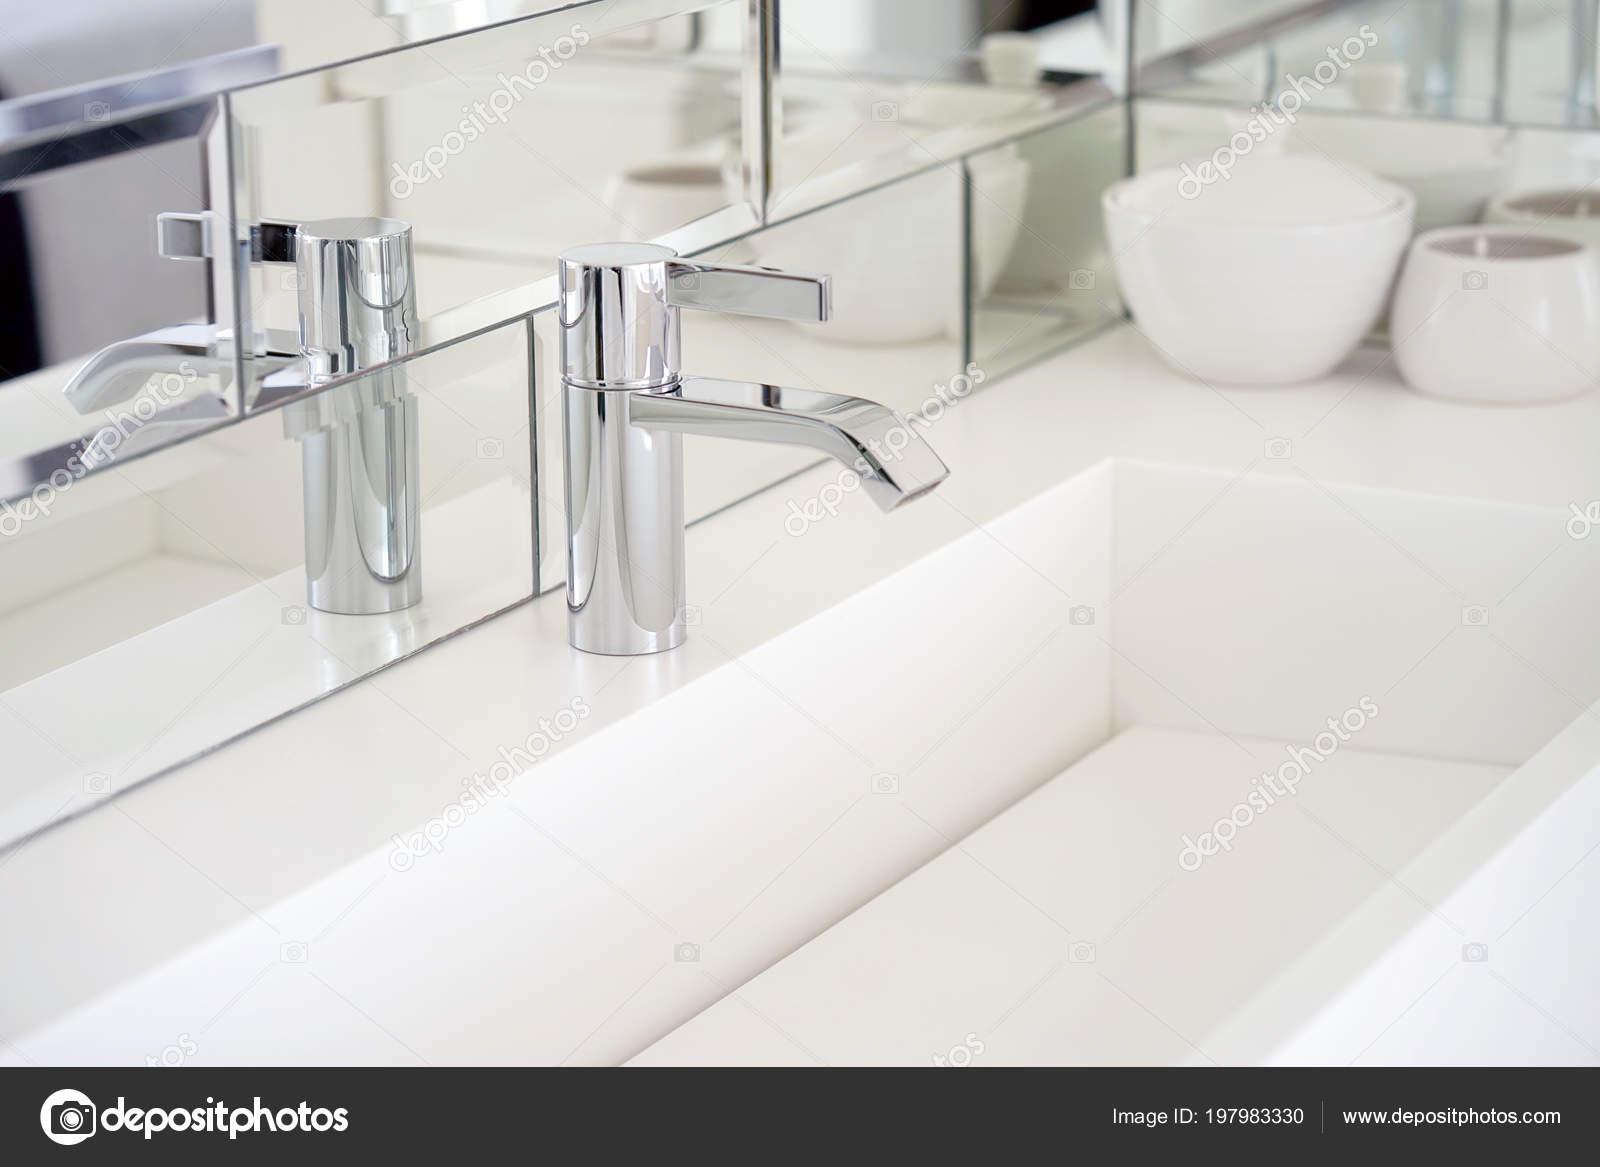 Badkamer interieur wastafel met modern design interieur van